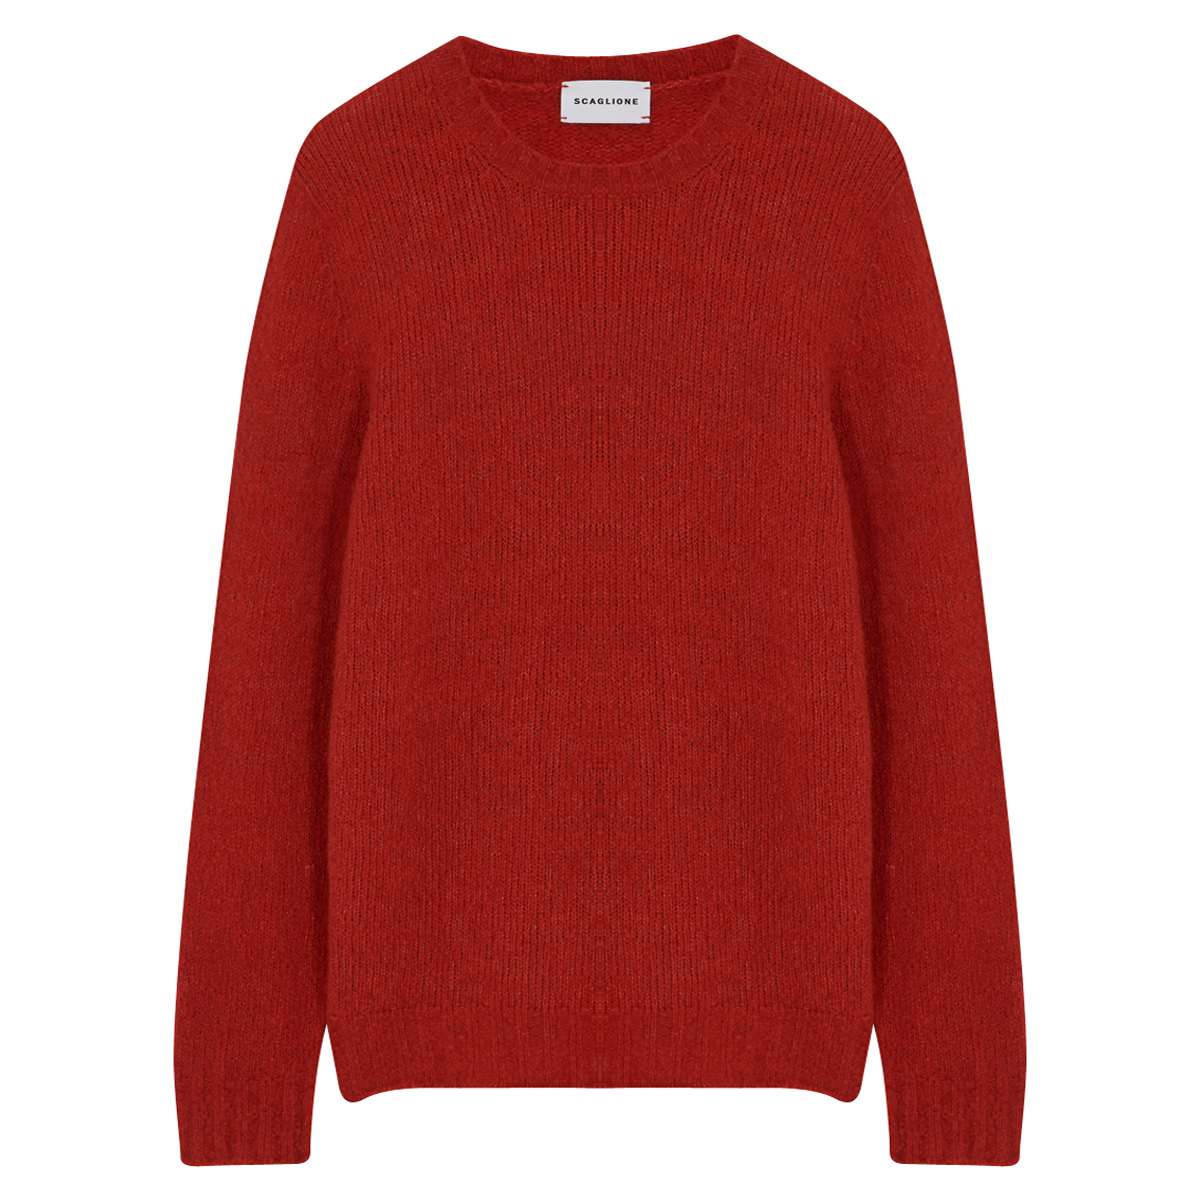 Red Wool Cashmere Crewneck Jumper